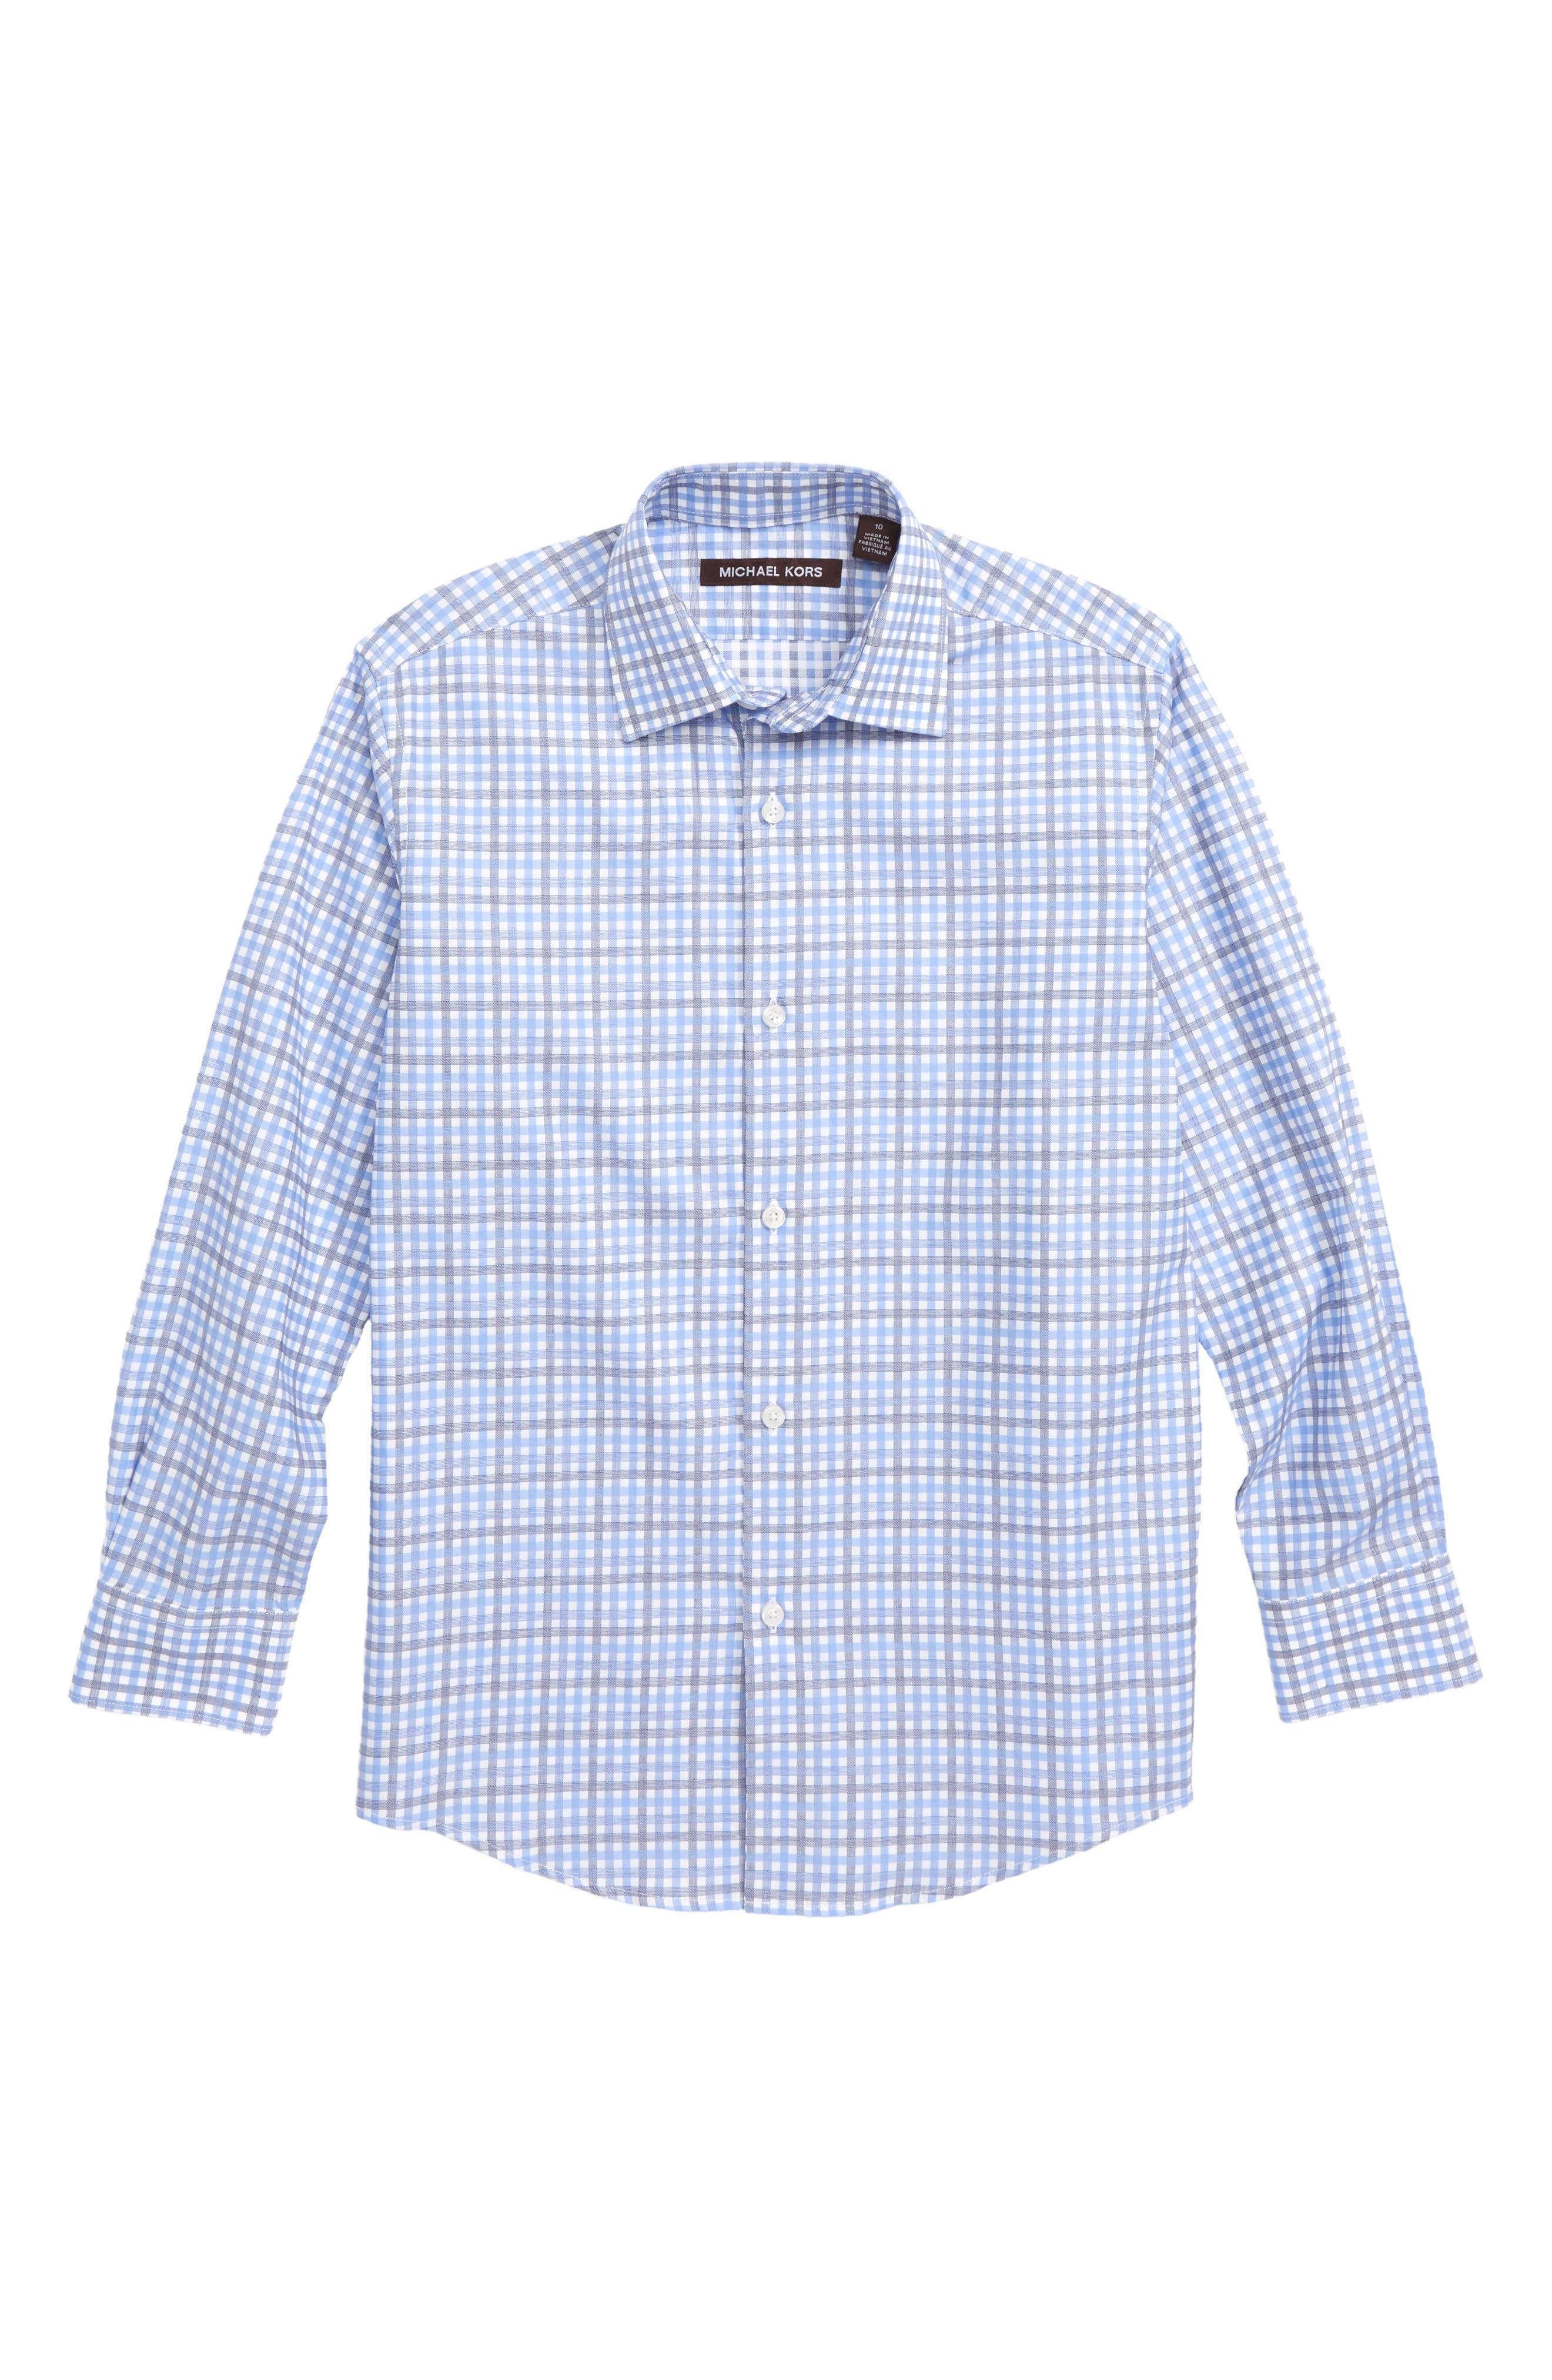 Check Print Dress Shirt,                         Main,                         color, BLUE